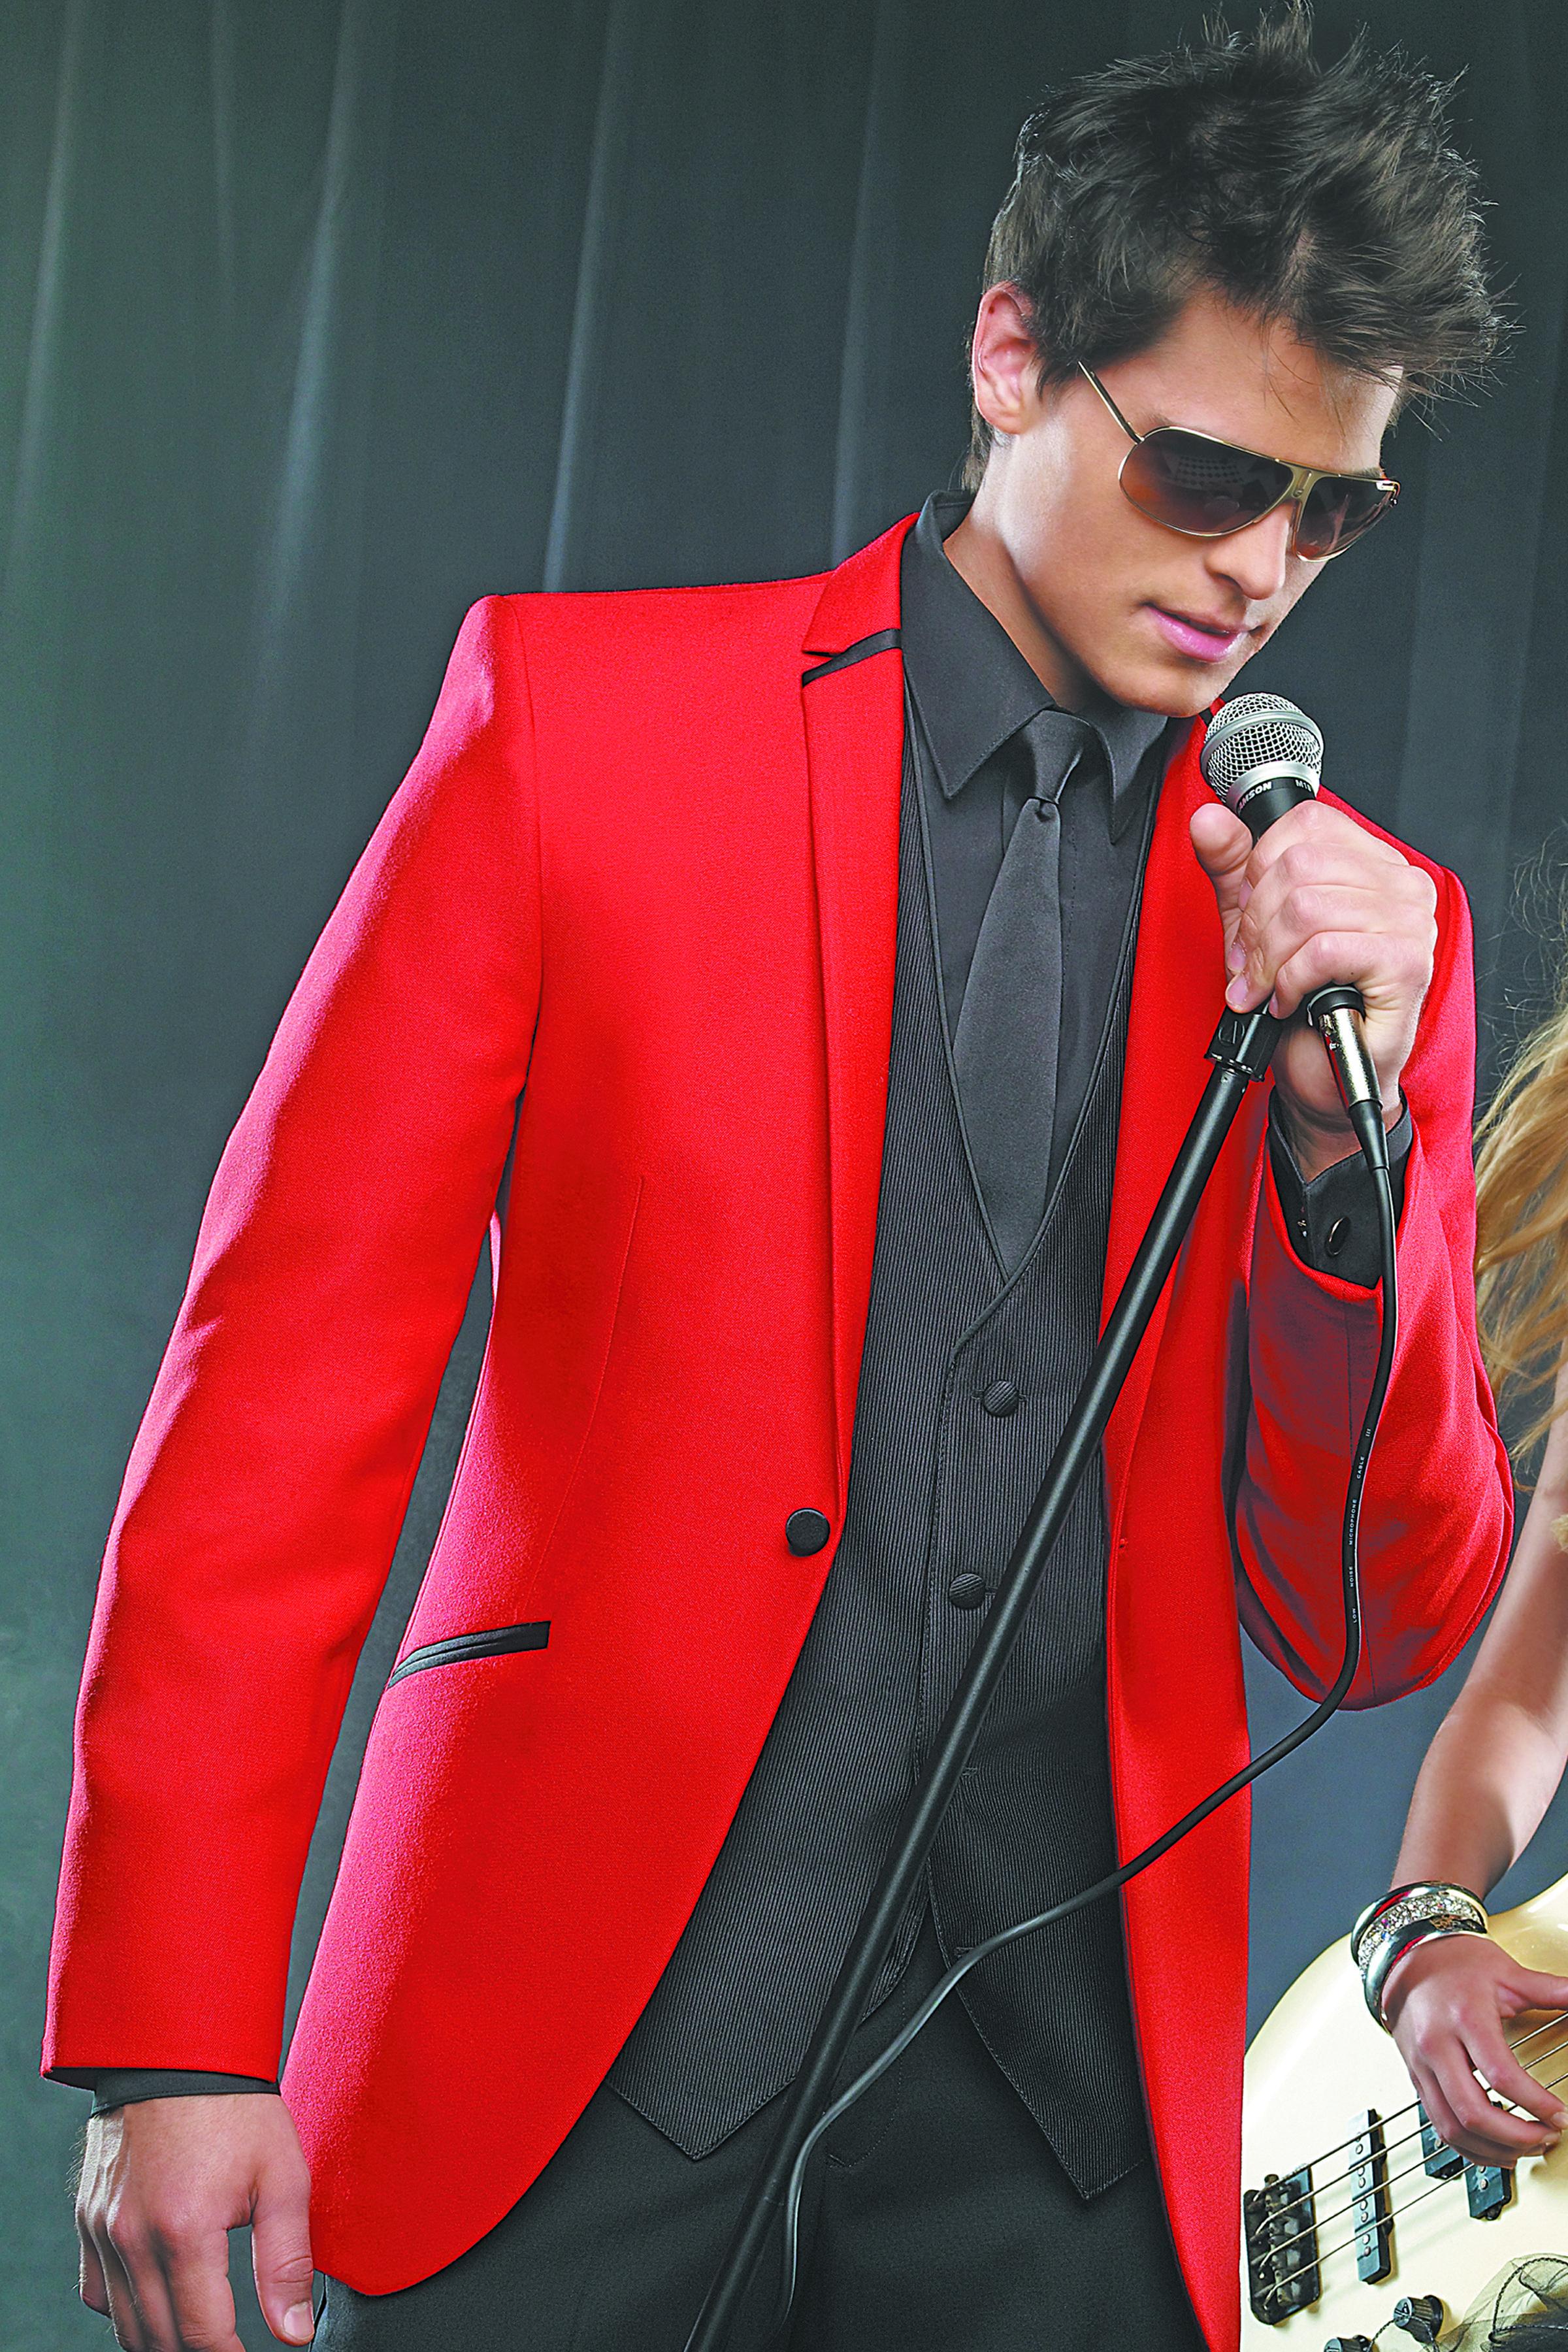 Dunhill Tuxedos Bridal Blog - Dunhill Tuxedos- red illusion tux ...